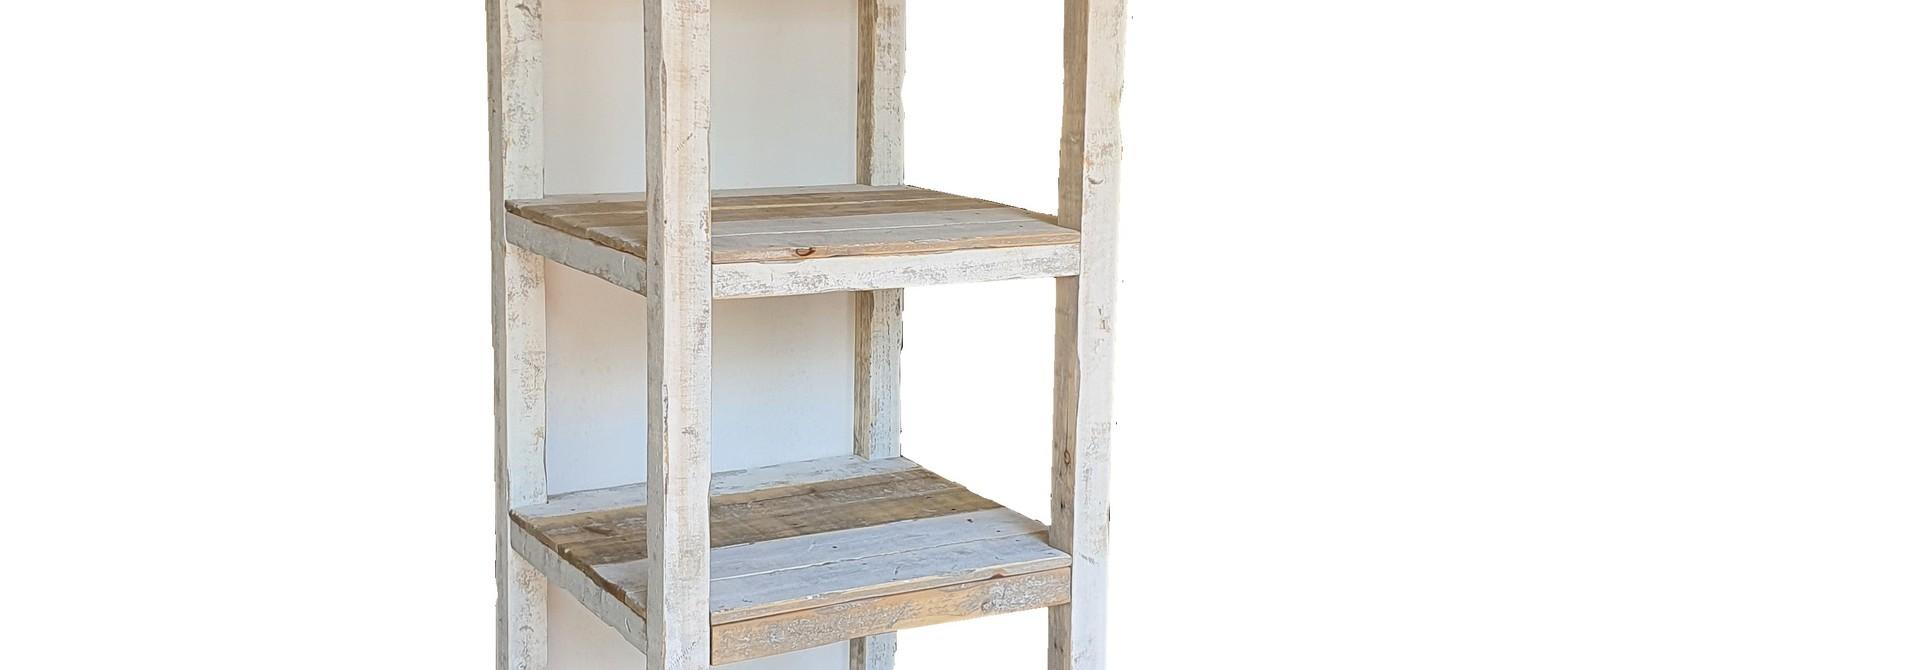 shop int ibiza white cabinet C 54